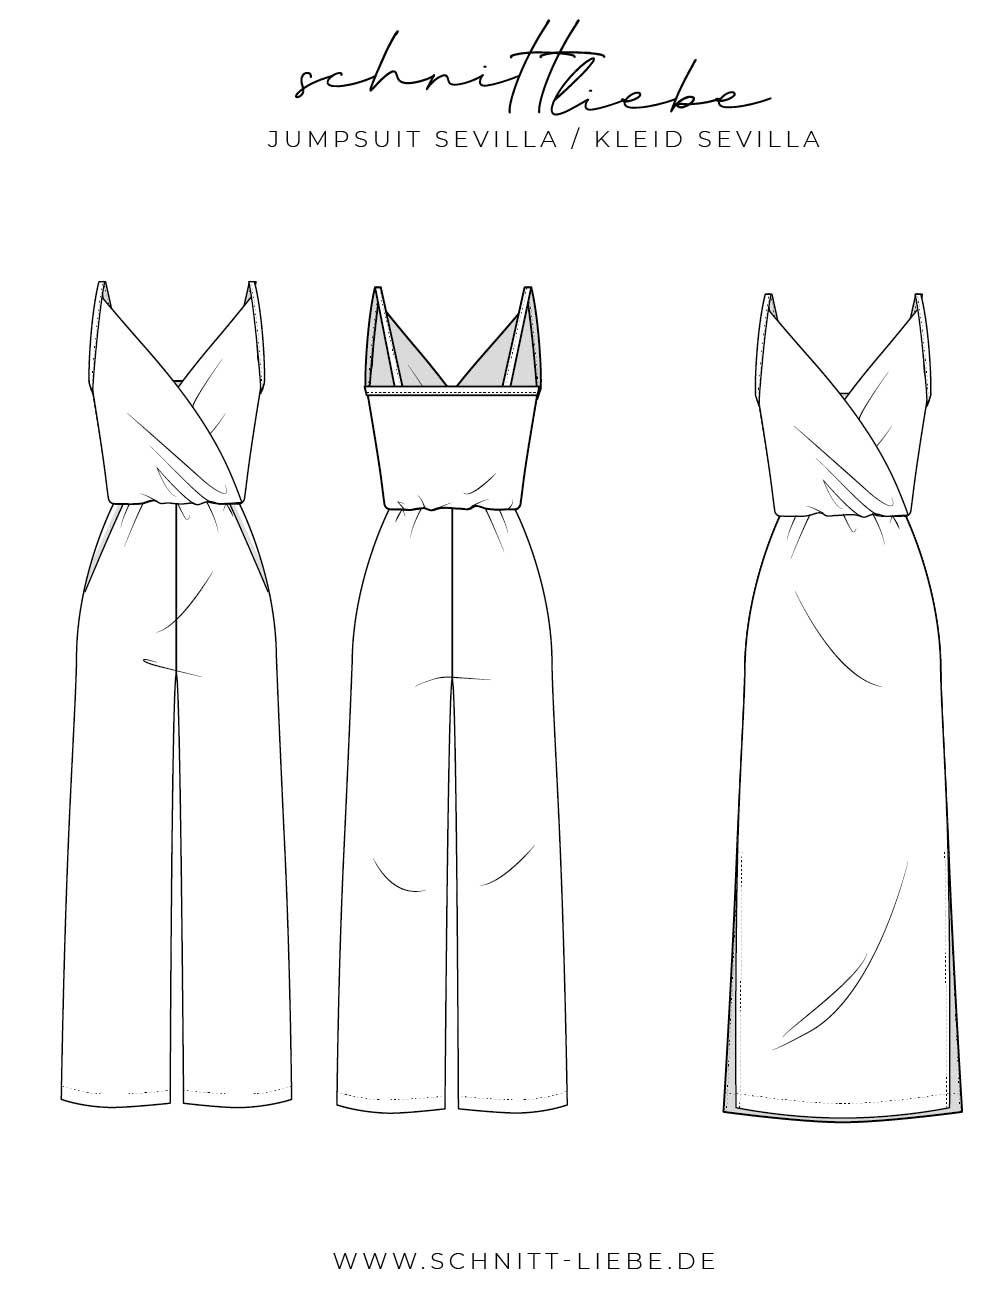 Schnittmuster Jumpsuit & Kleid Sevilla - Schnittliebe #keinekleidungnähen